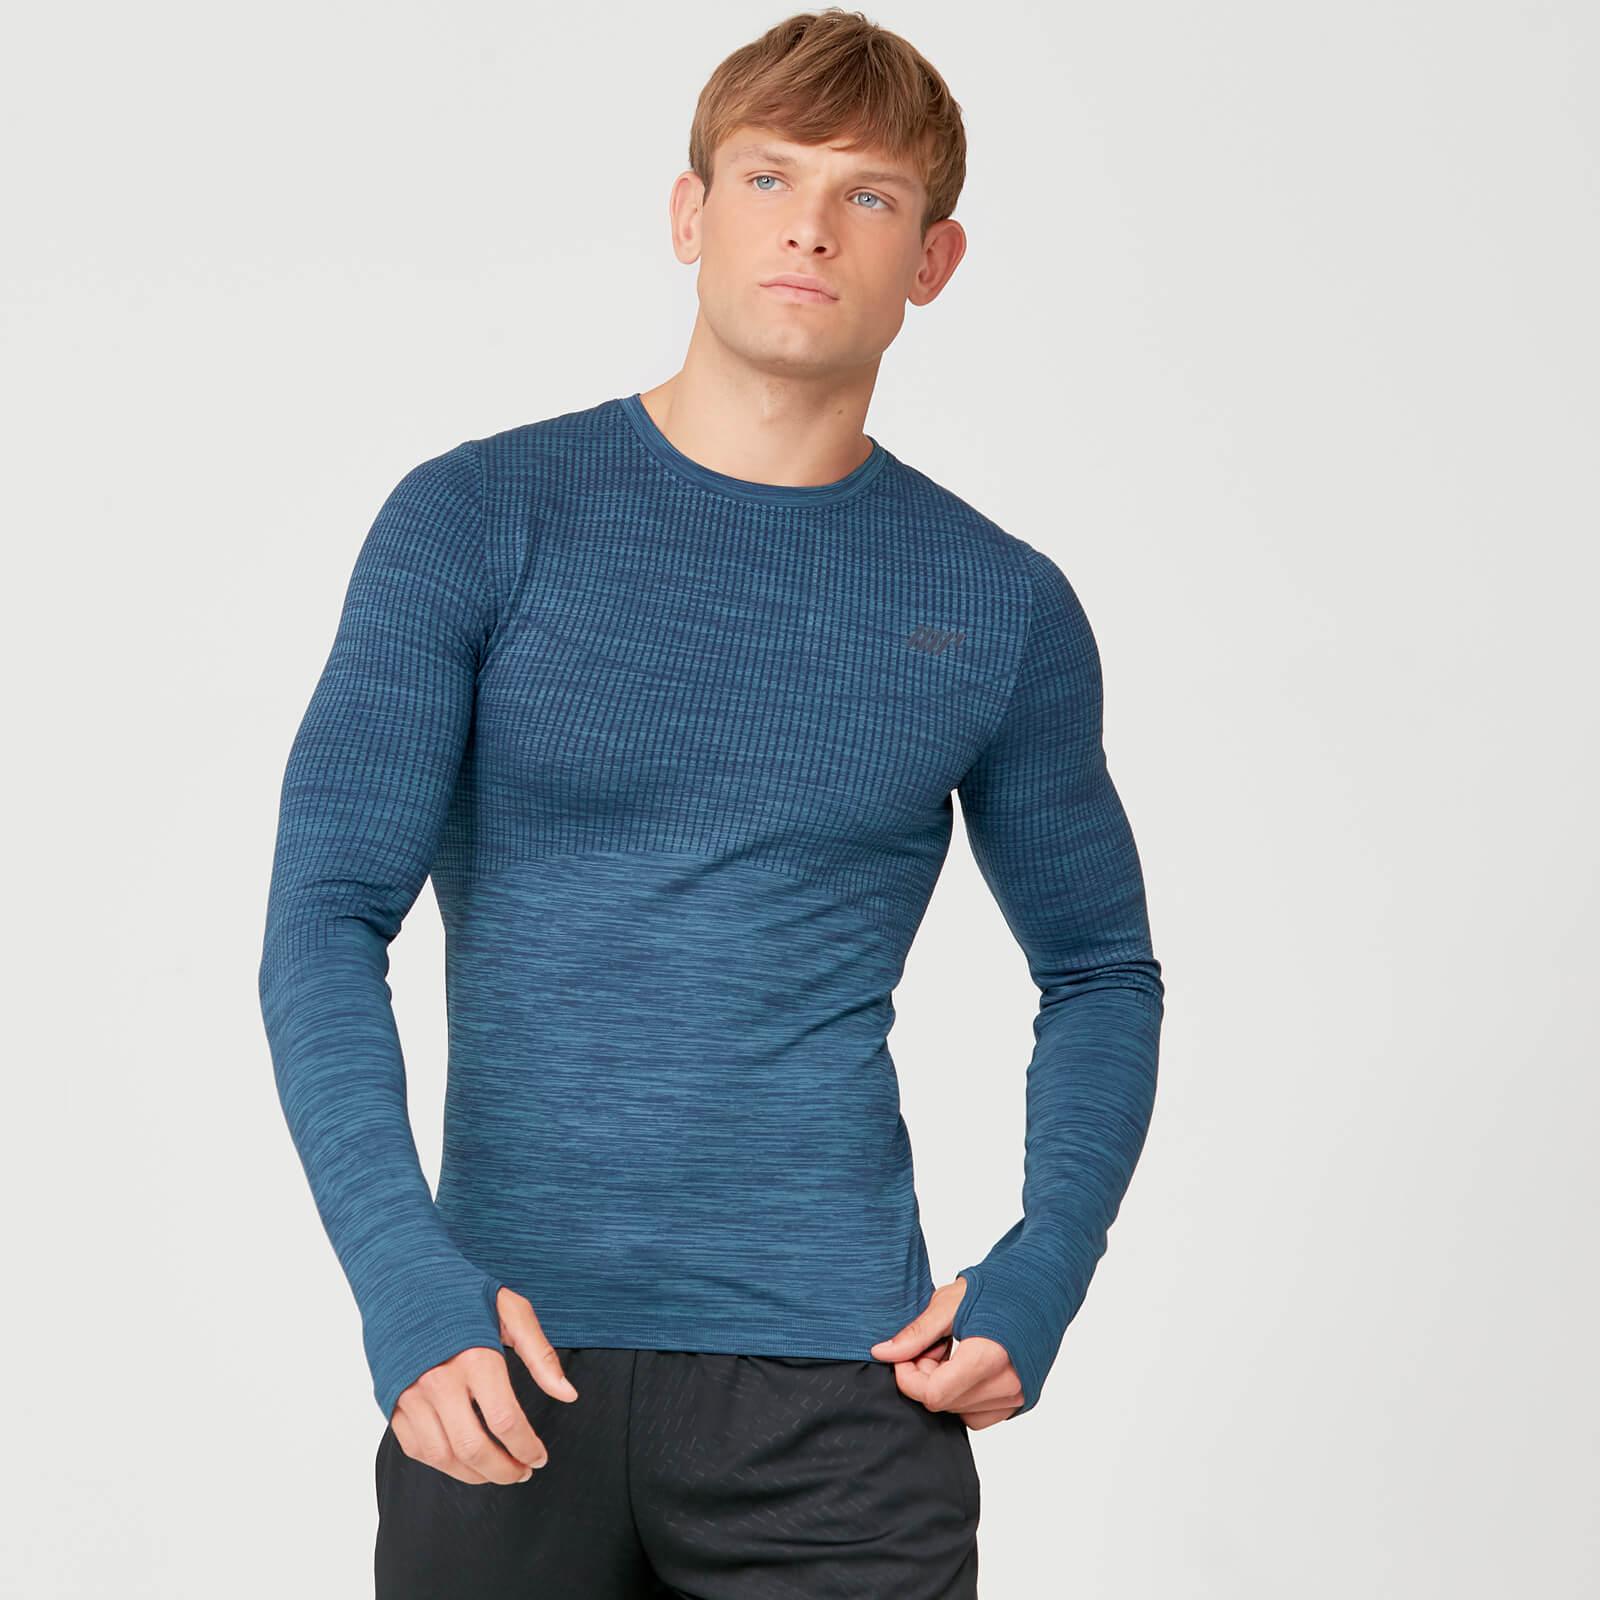 Myprotein Seamless Long Sleeve T-Shirt - Petrol Blue - S